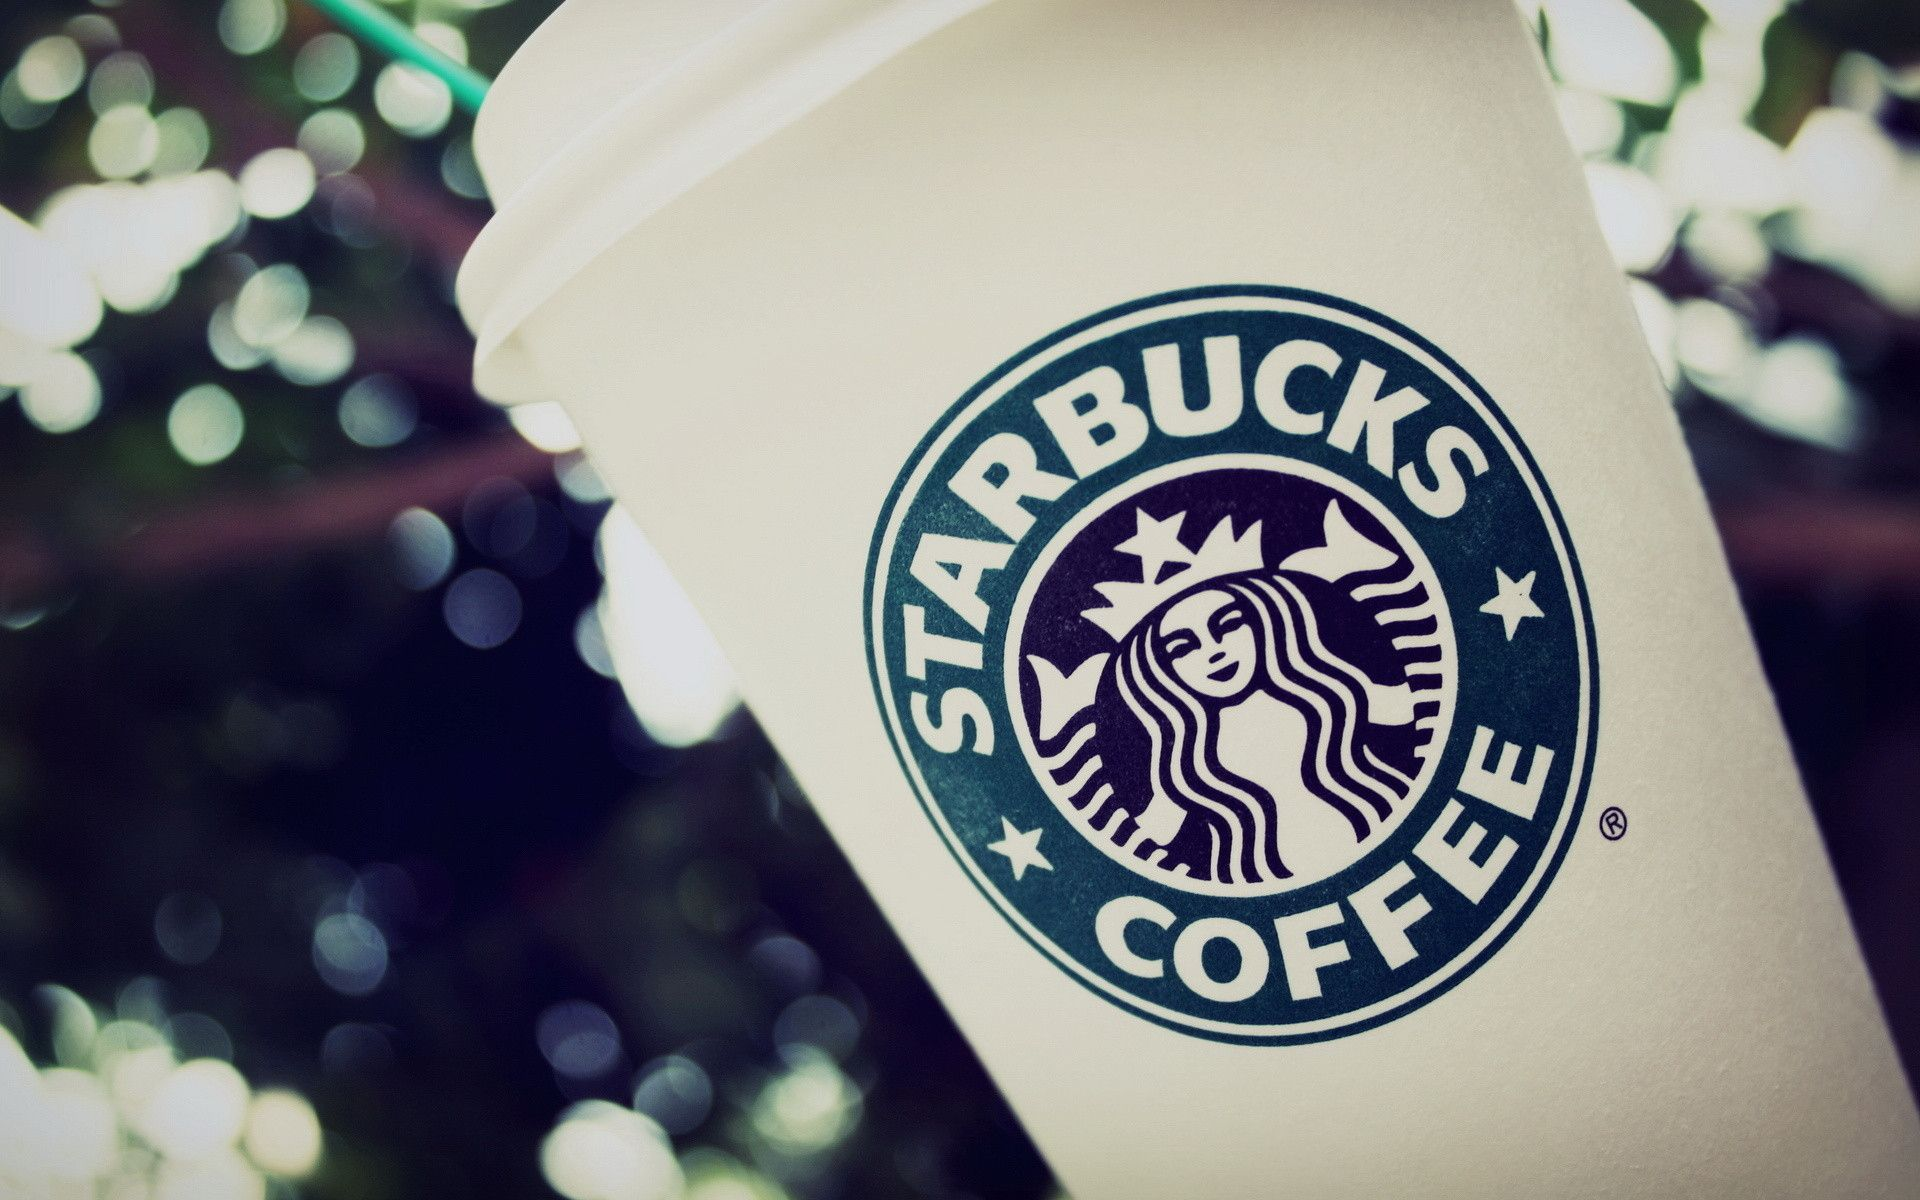 Cute Starbucks Wallpaper Images Best Wallpaper Hd Starbucks Wallpaper Starbucks Coffee Tumblr